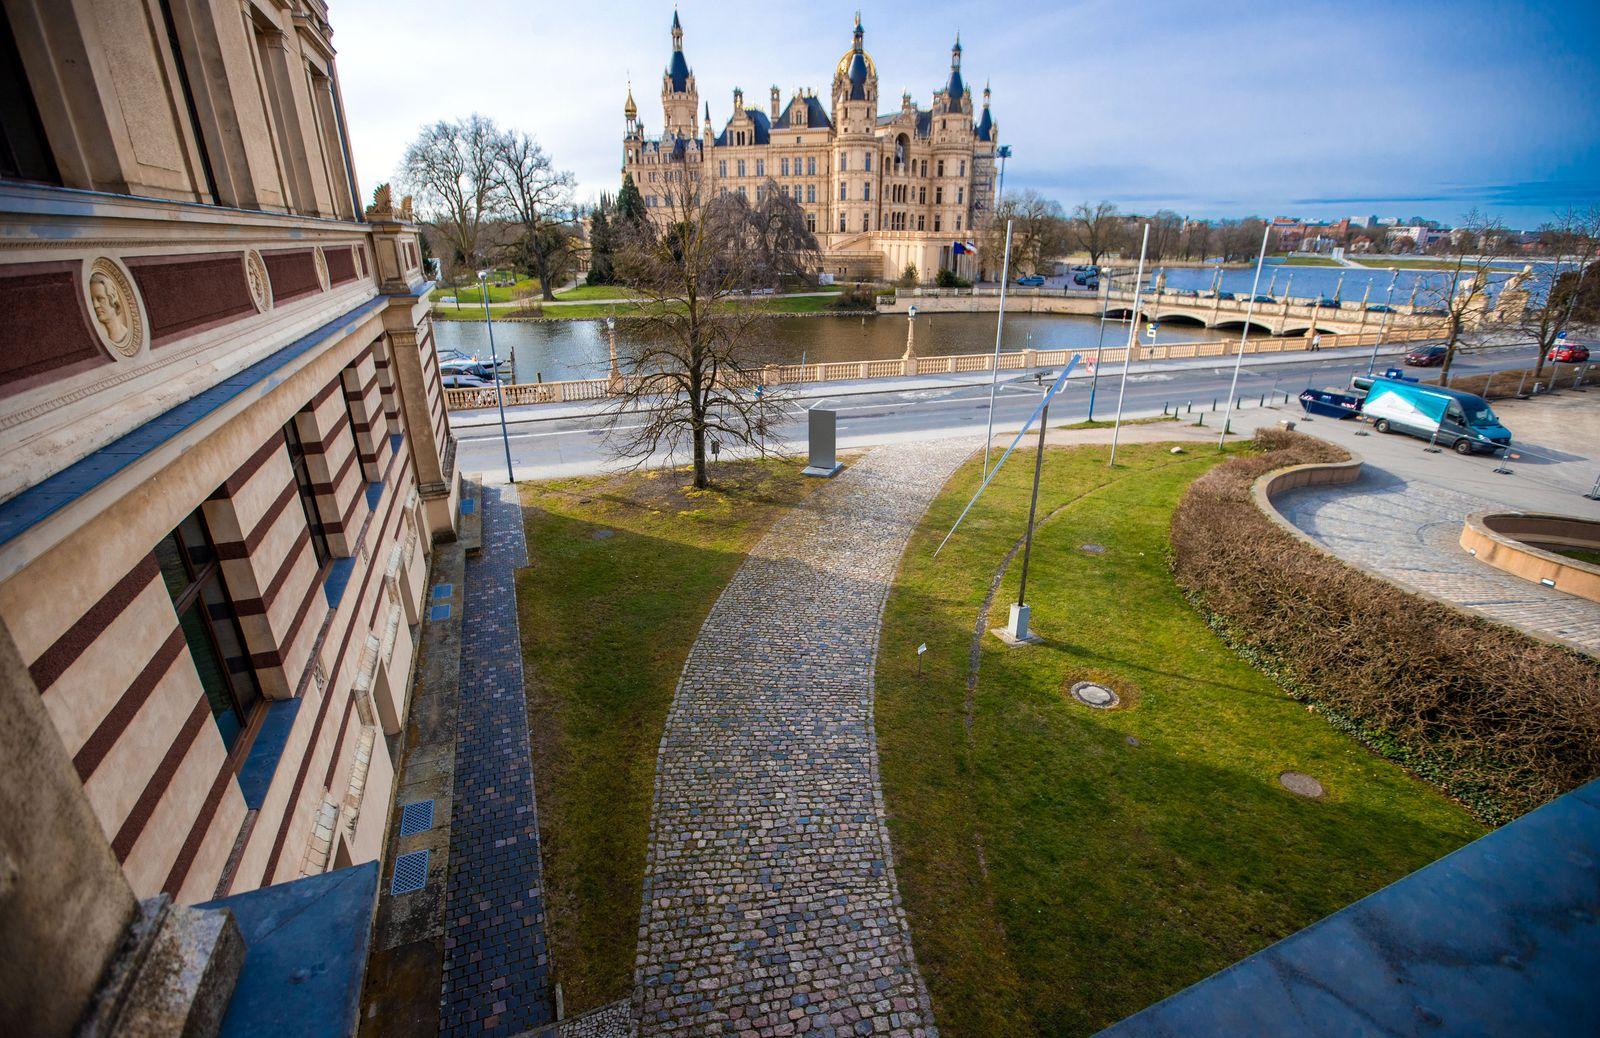 Coronavirus - Schwerin - Neue Lockdown-Regelungen